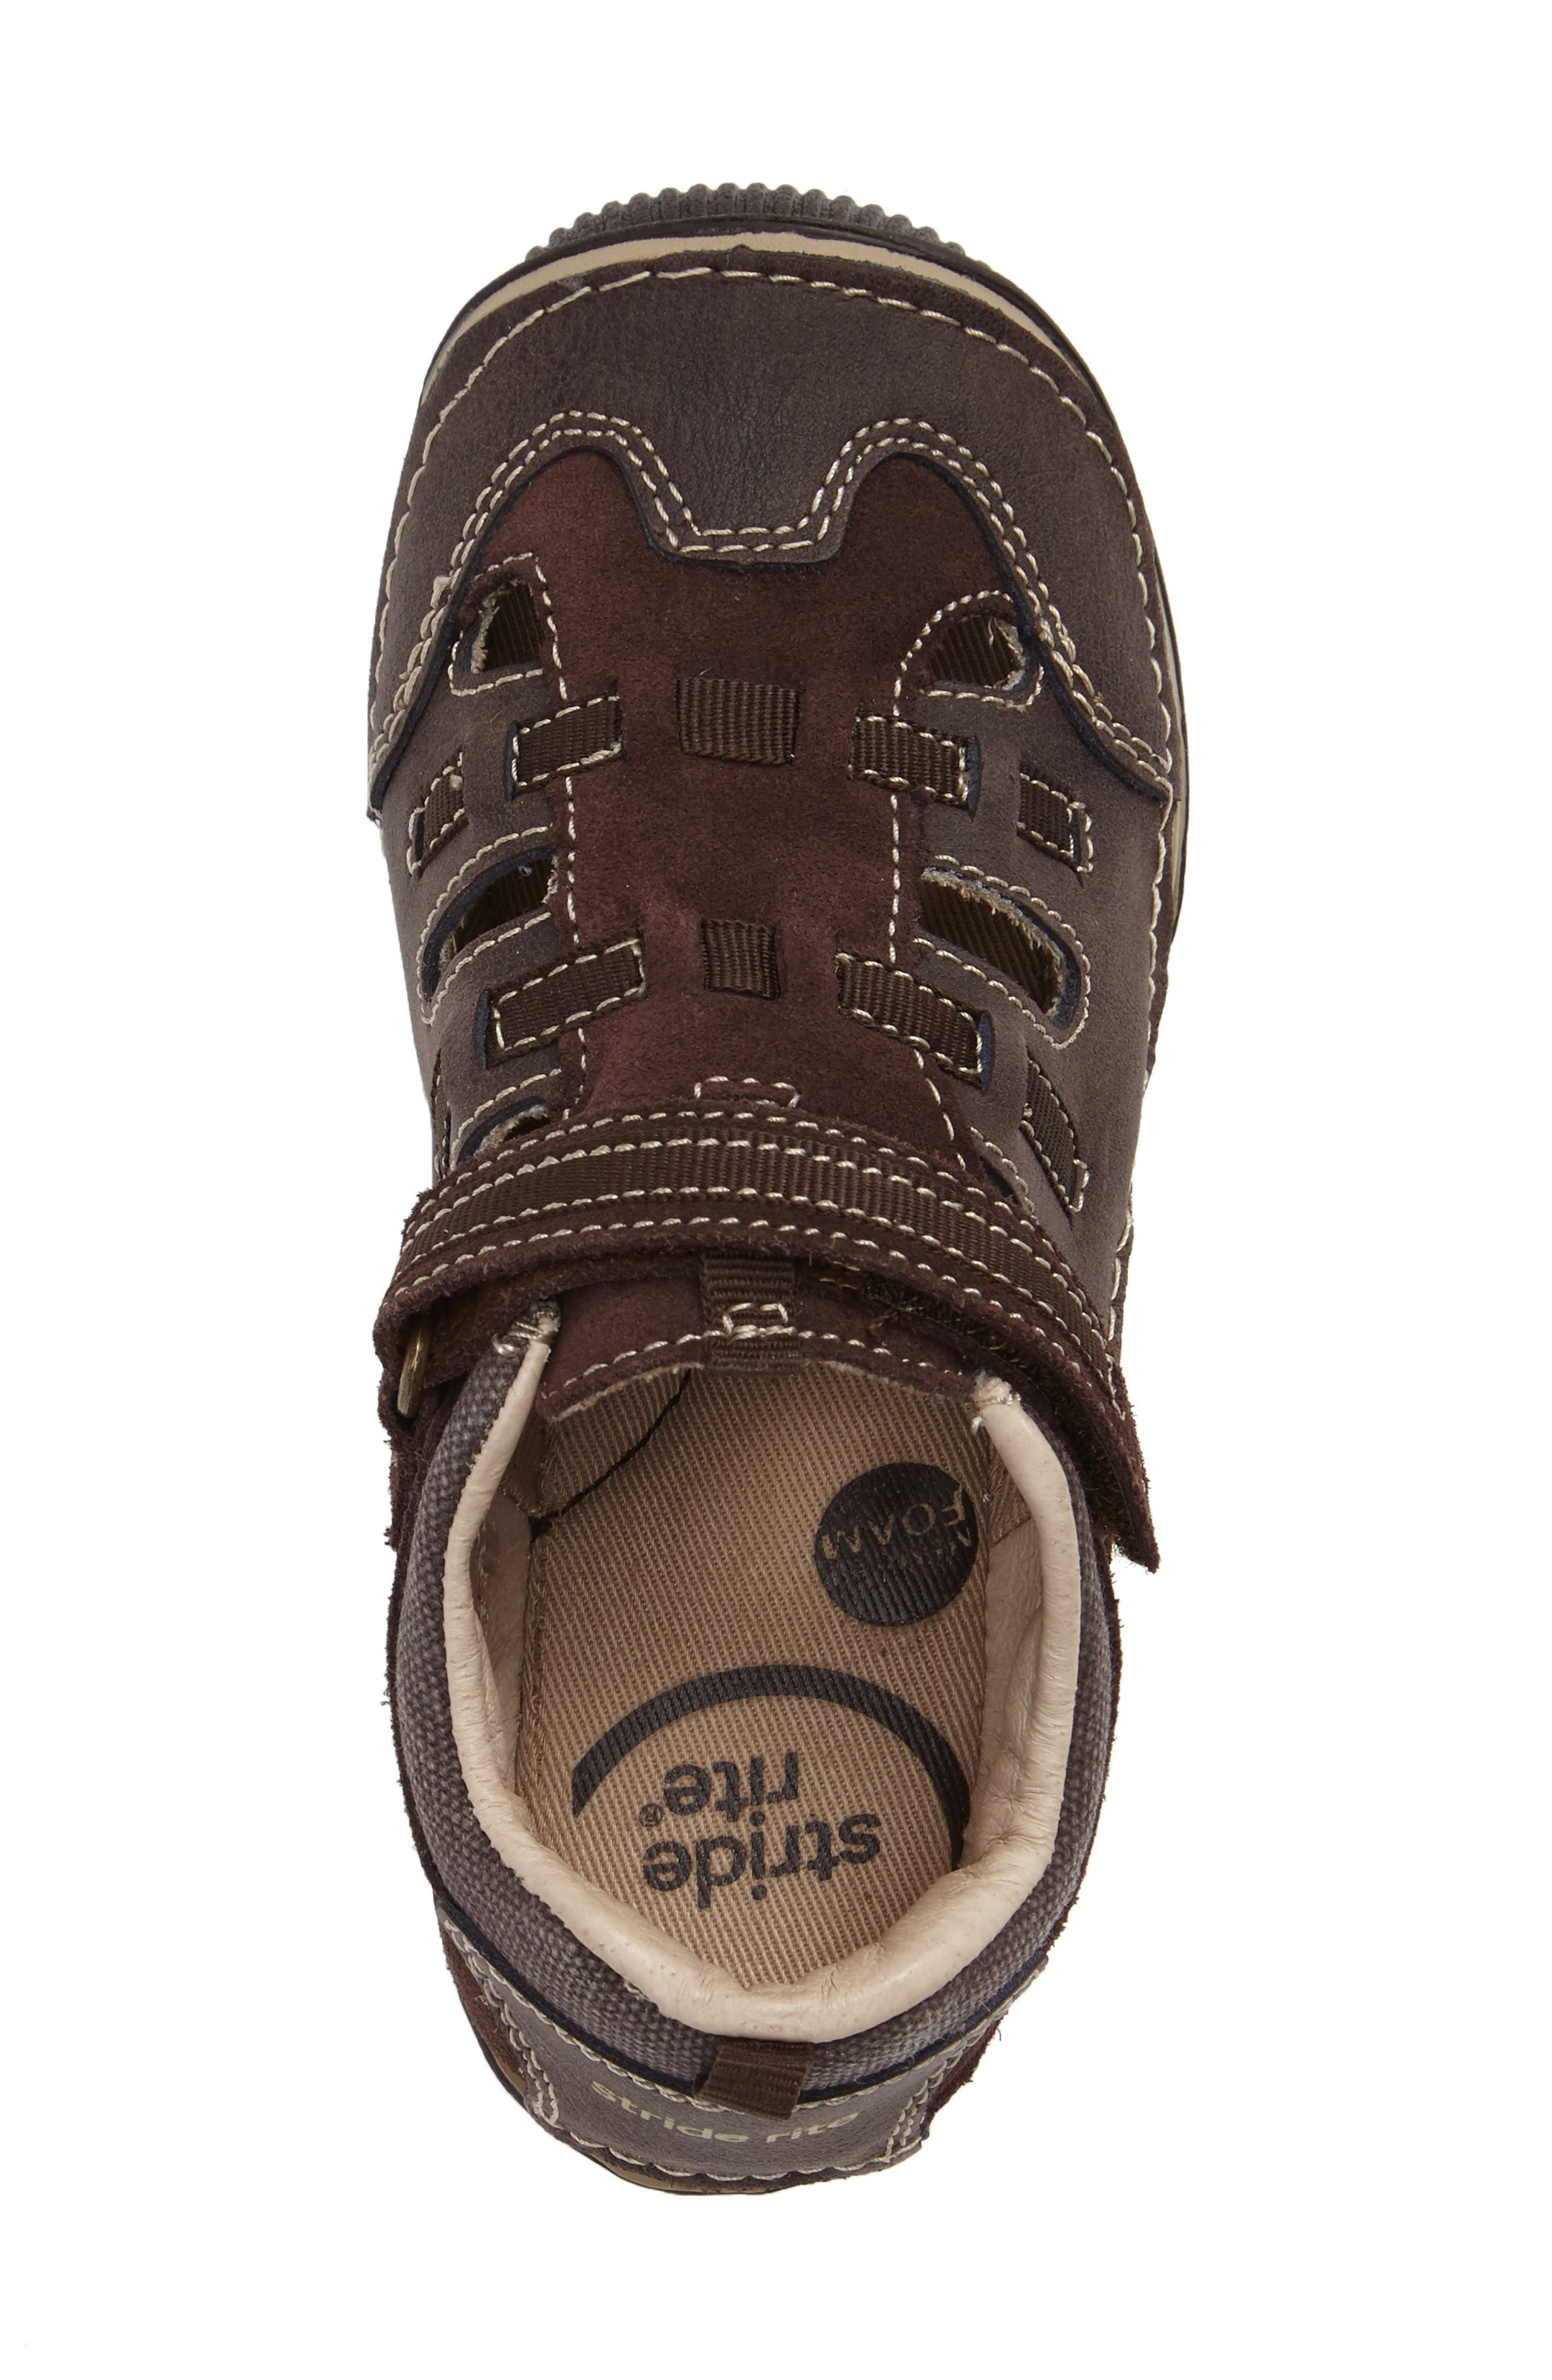 Reggie Cutout Sneaker,                             Alternate thumbnail 3, color,                             Brown Leather